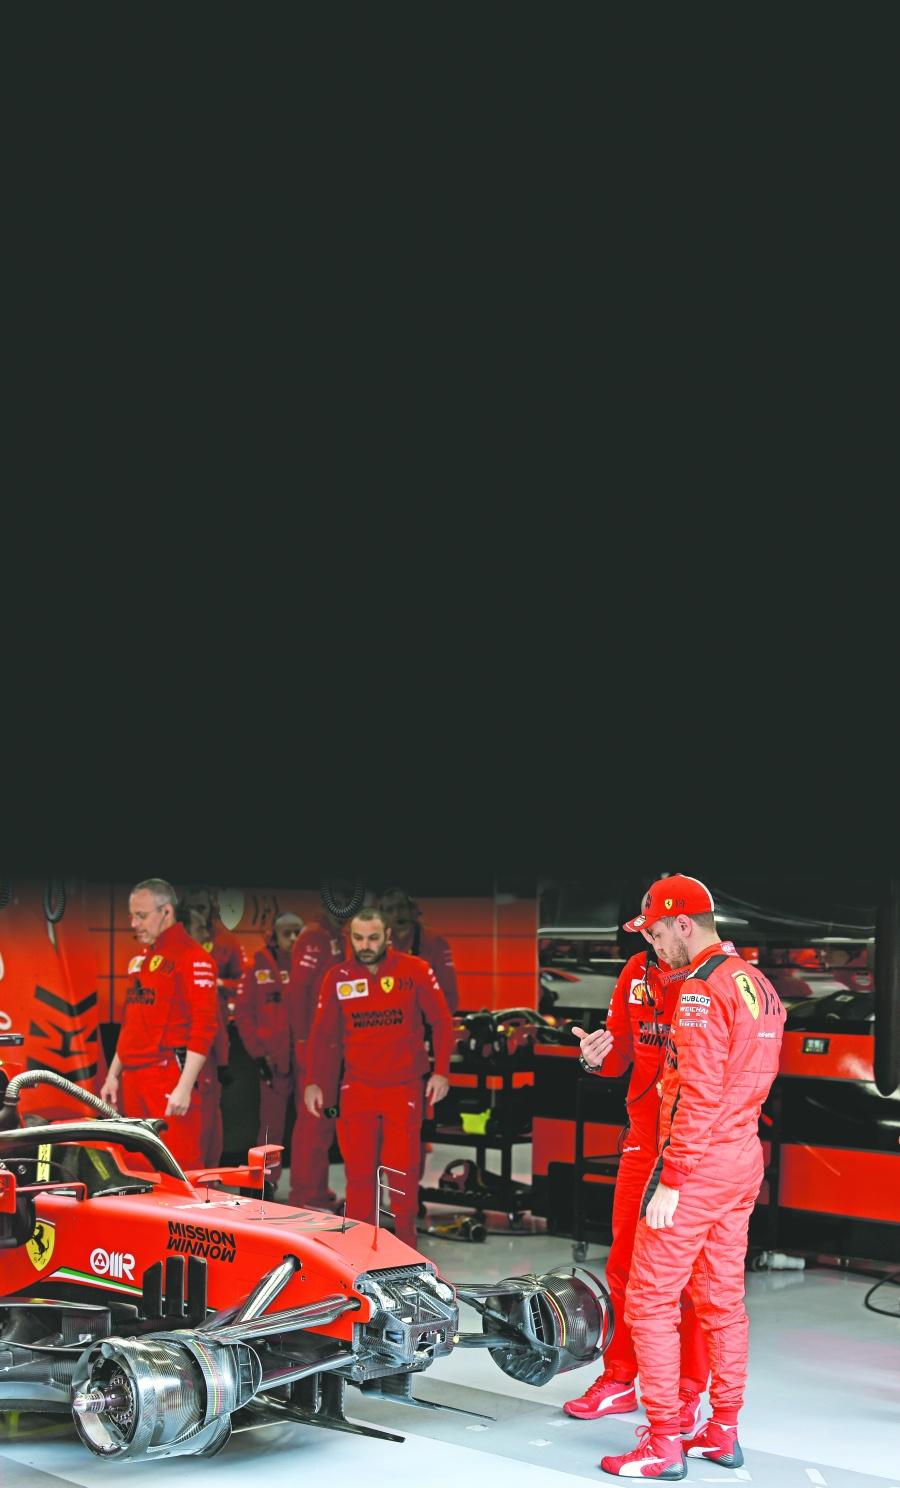 Siete equipos de Fórmula 1 piden a FIA transparencia